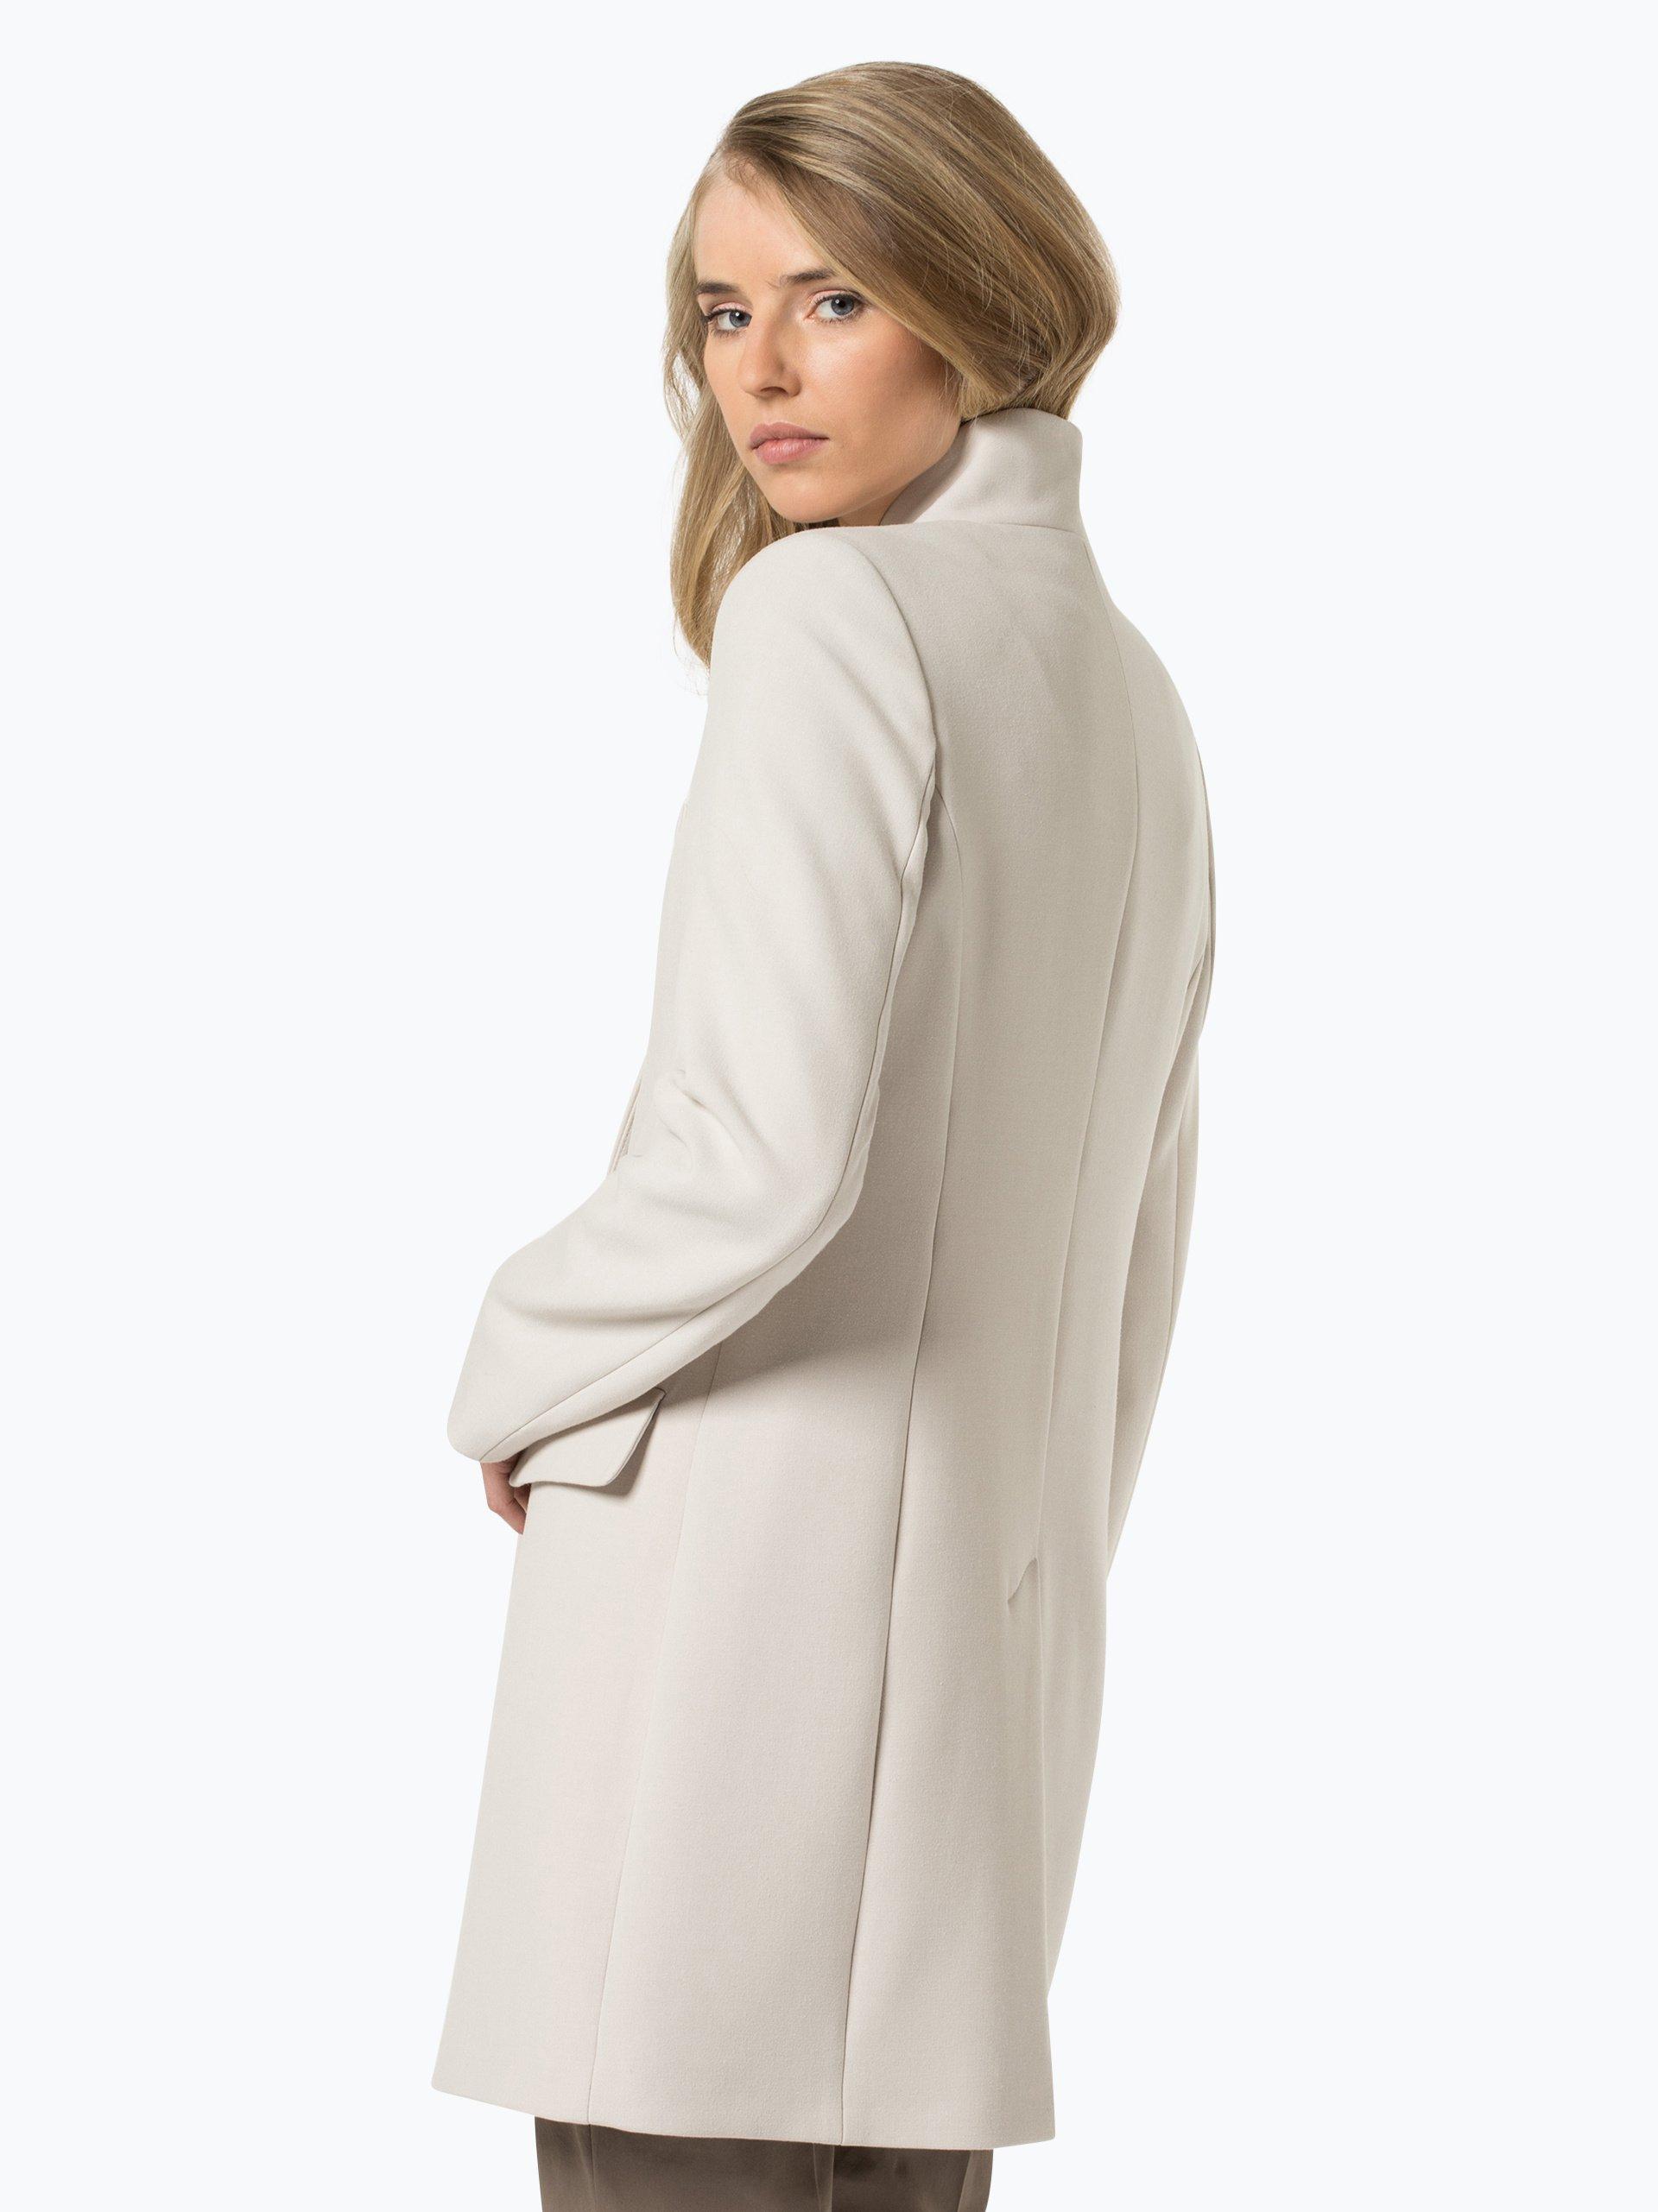 fuchs schmitt damen mantel kitt uni online kaufen peek und cloppenburg de. Black Bedroom Furniture Sets. Home Design Ideas